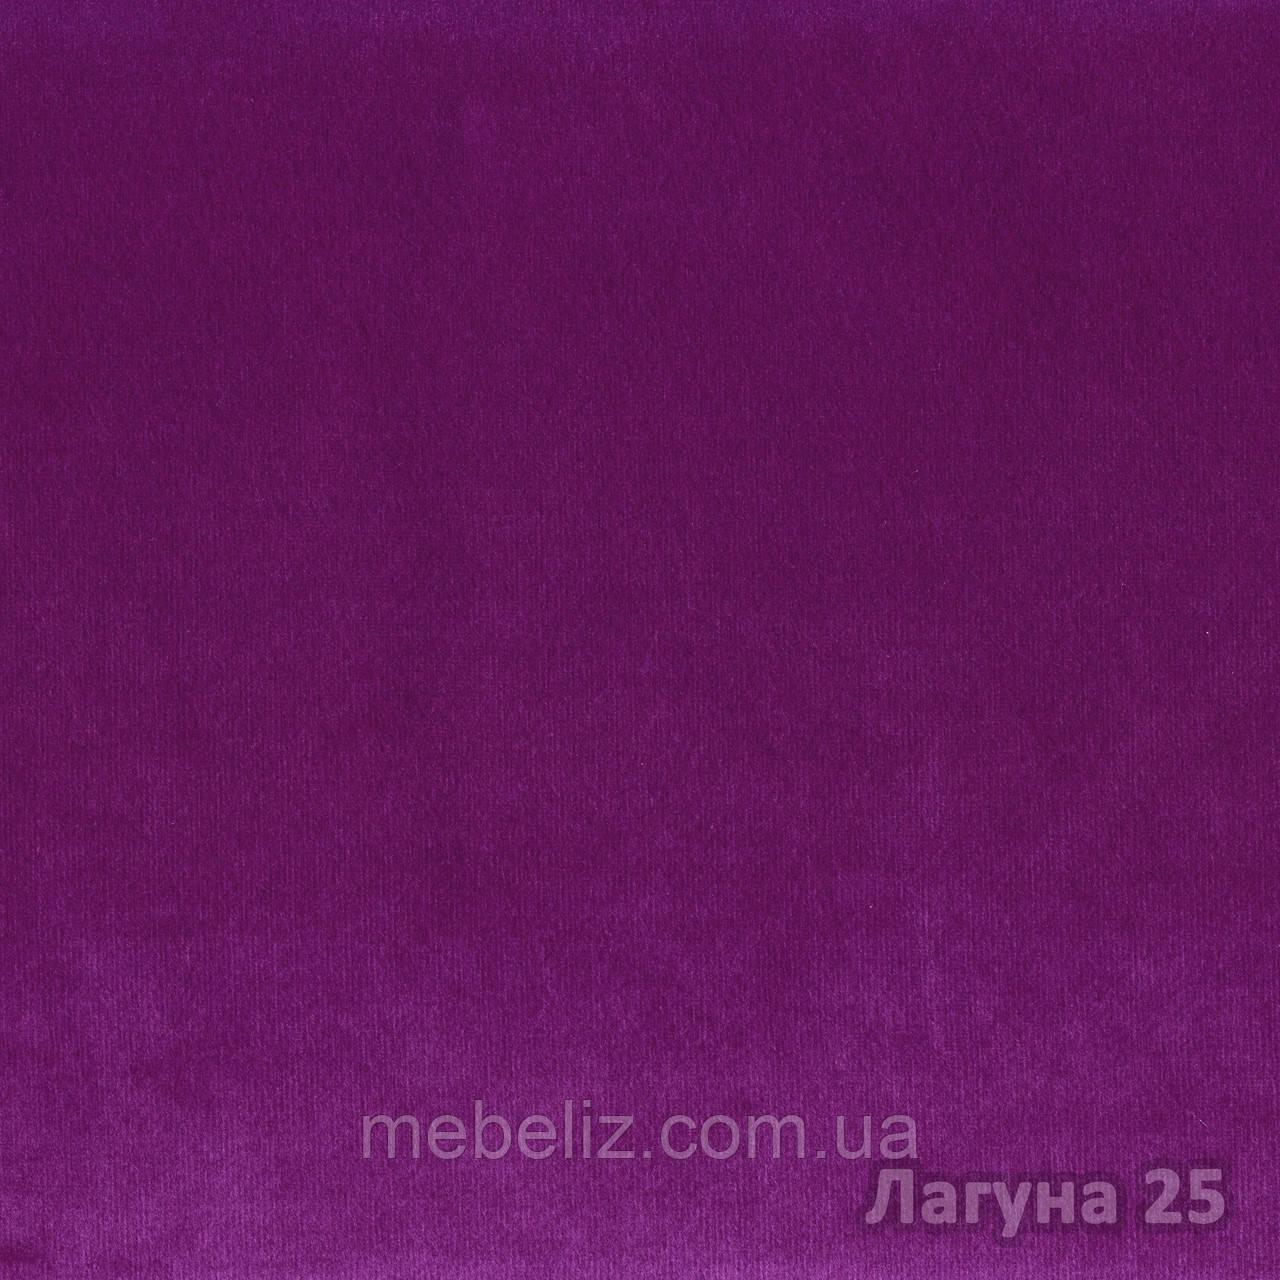 Тканина меблева оббивна Лагуна 25